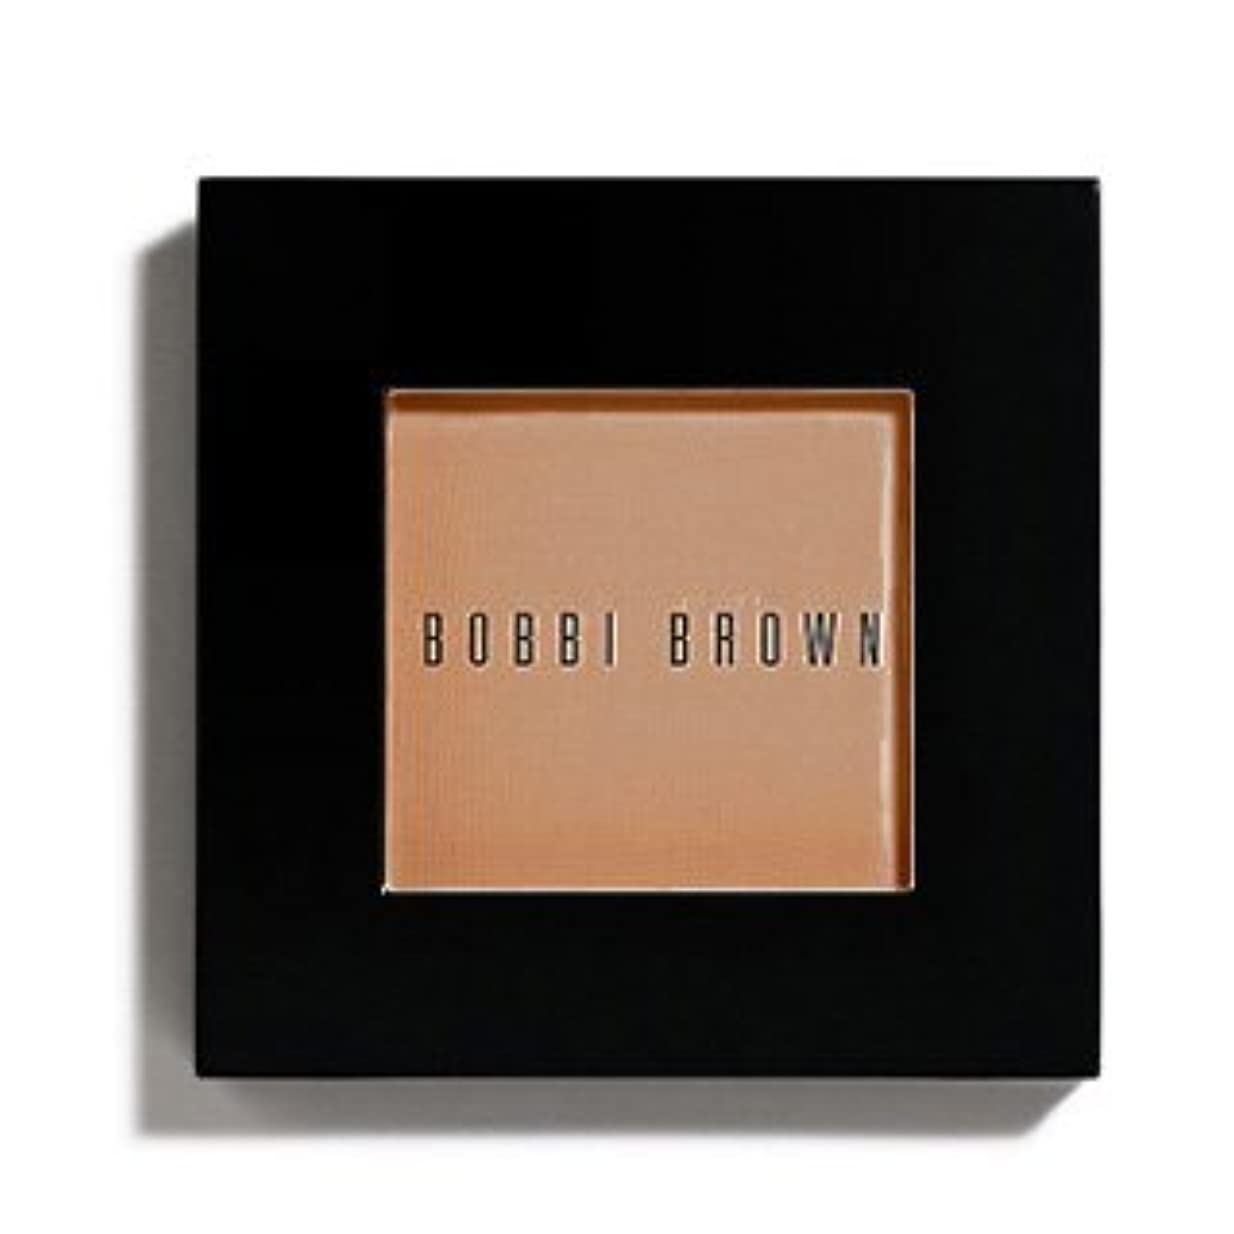 BOBBI BROWN ボビイ ブラウン アイシャドウ #14 Toast 2.5g [並行輸入品]